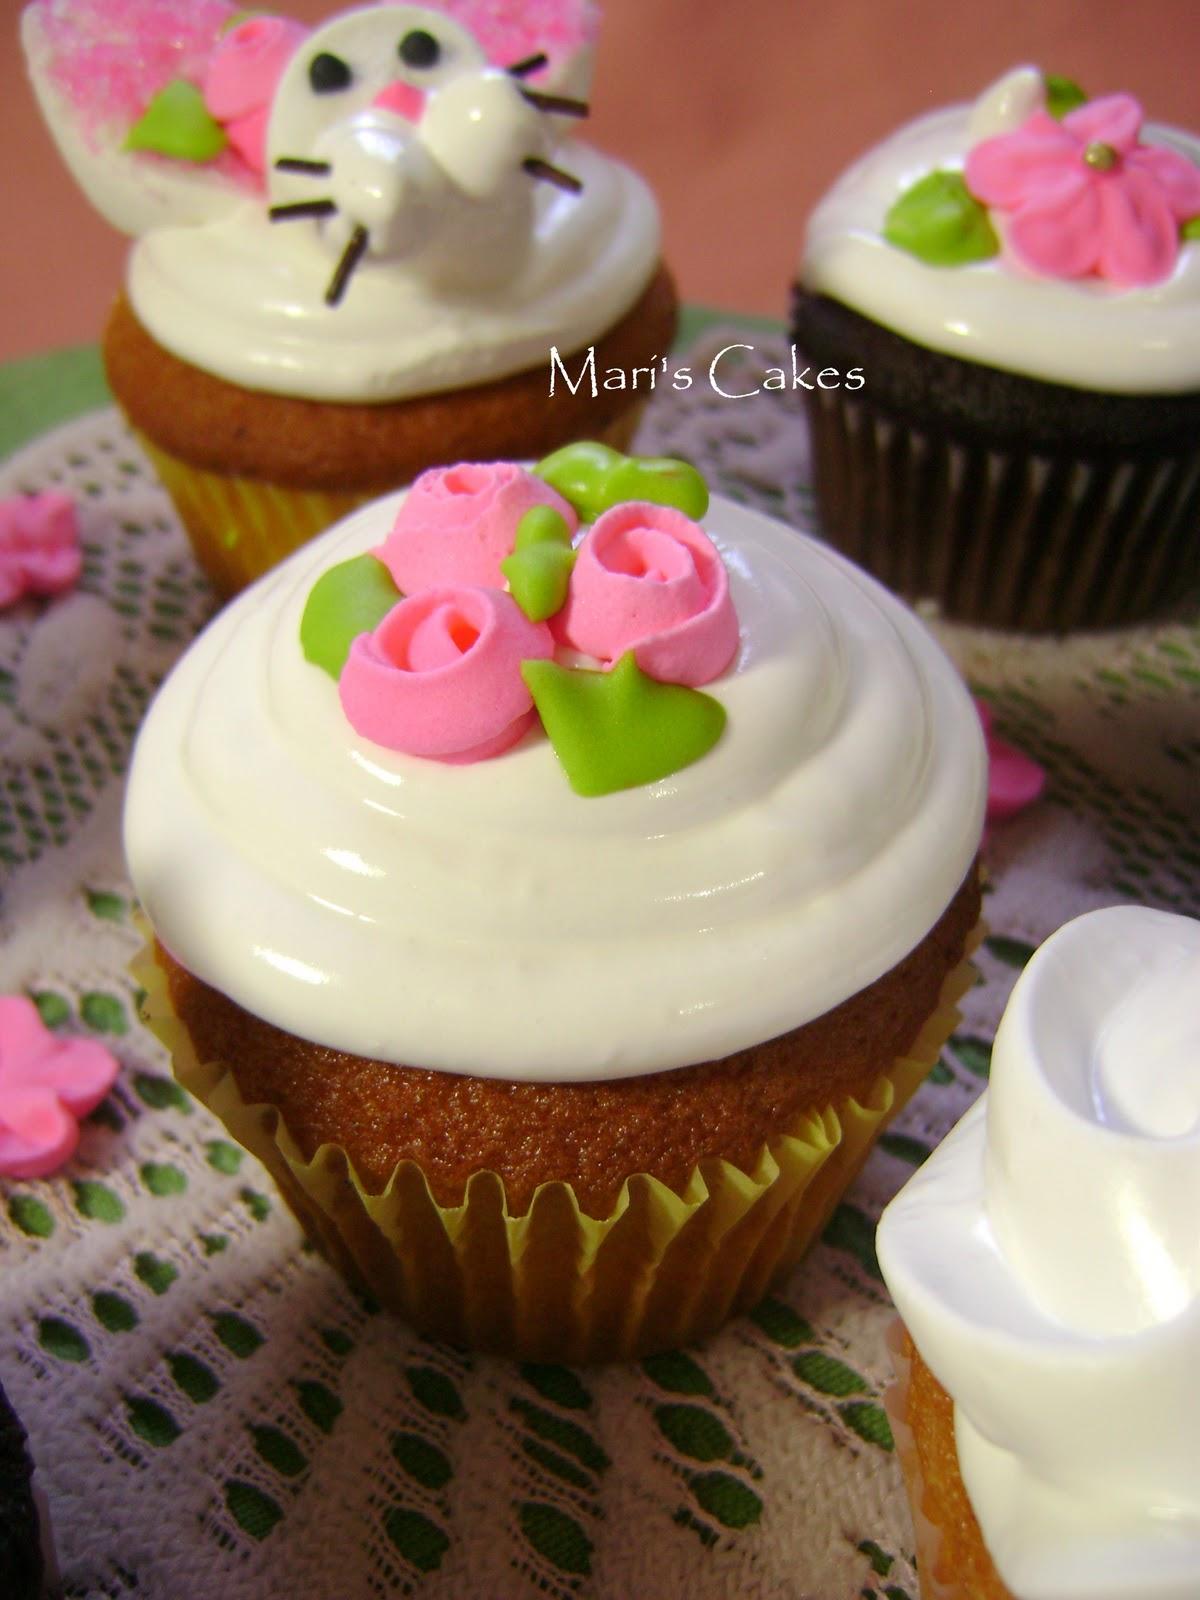 Suspiro de marshmallow o merengue de malvaviscos mari 39 s for Decoracion en cupcakes